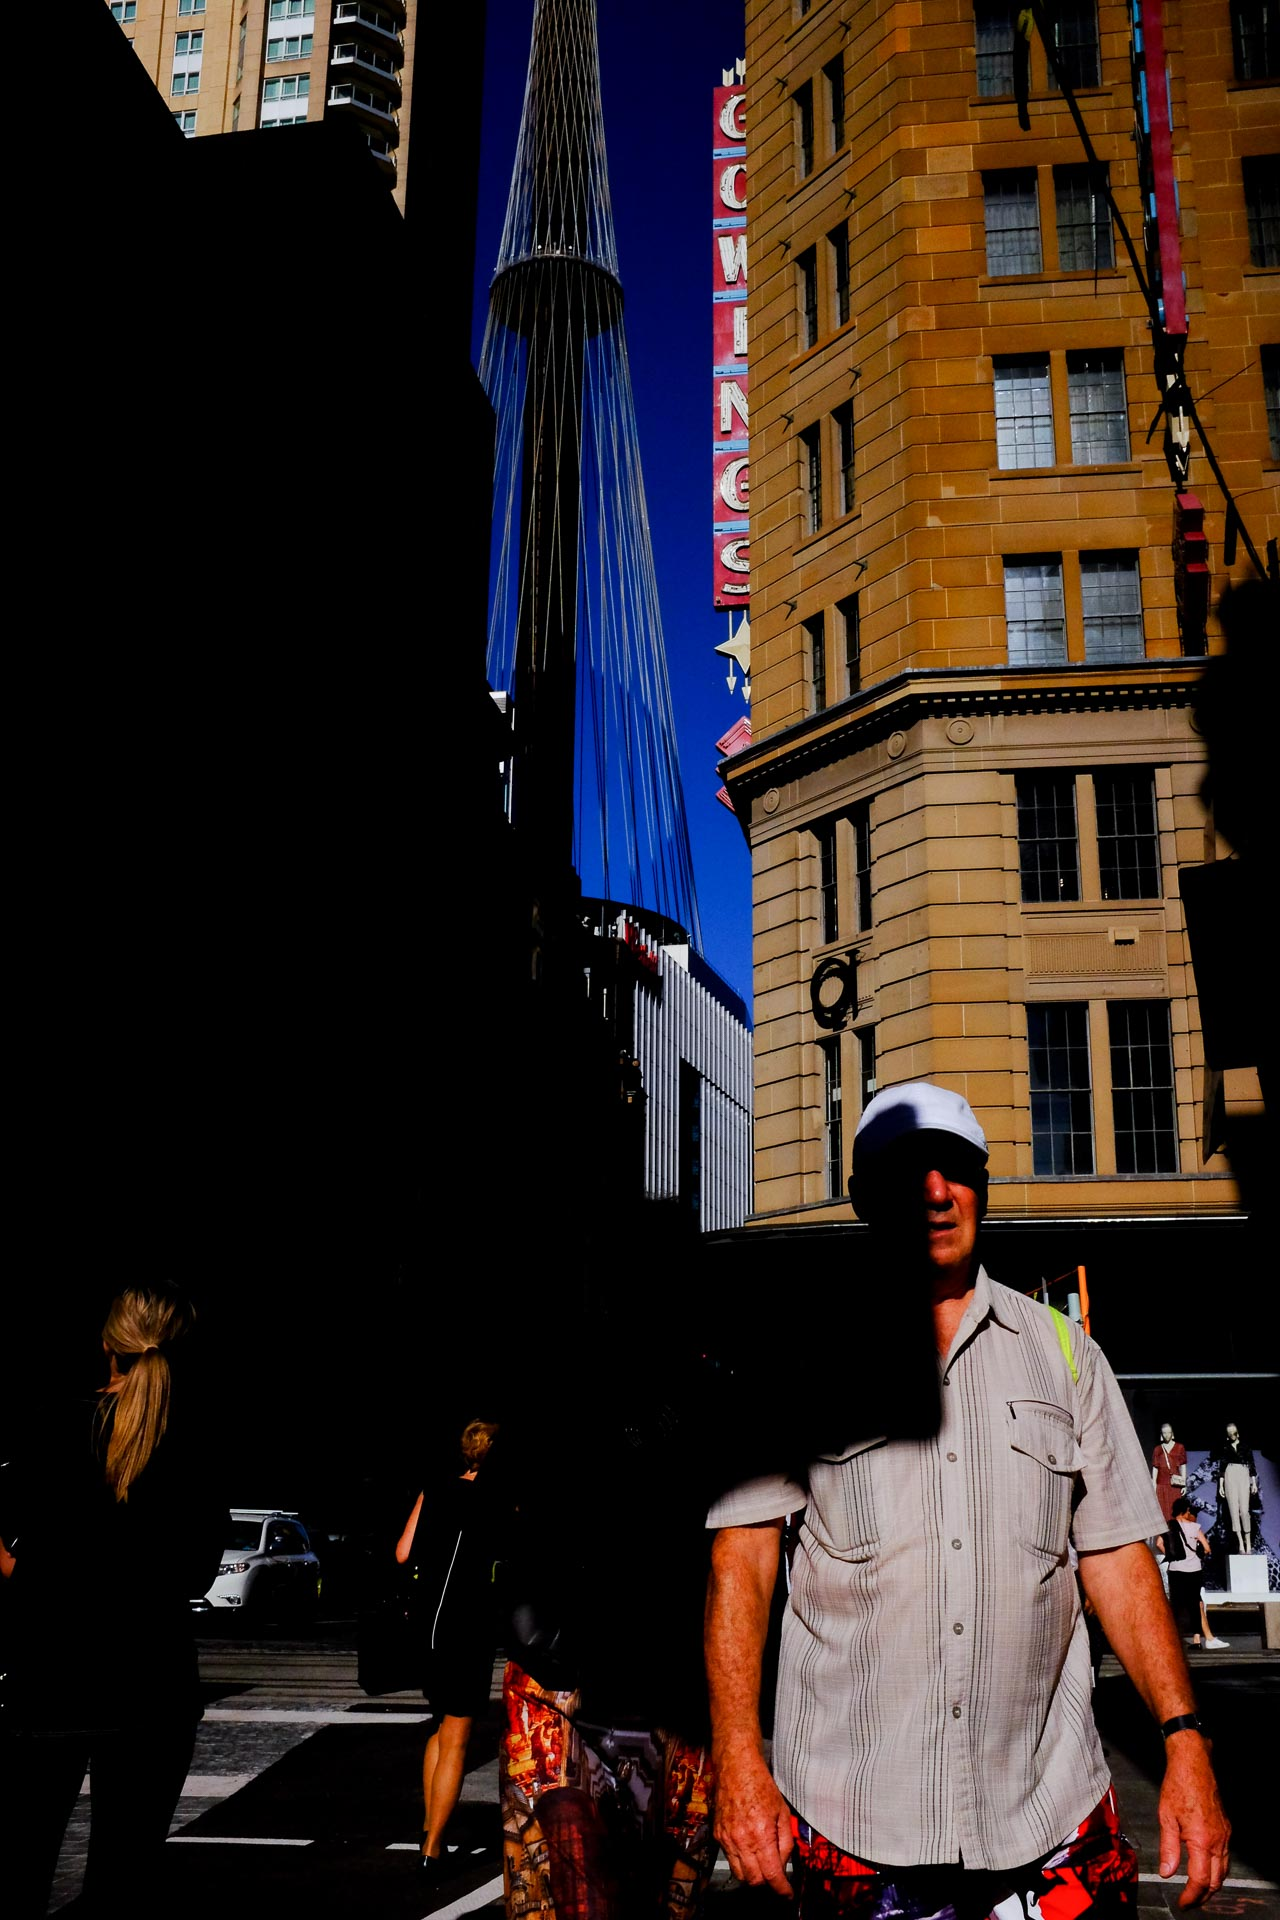 Sydney Street One 1.jpg